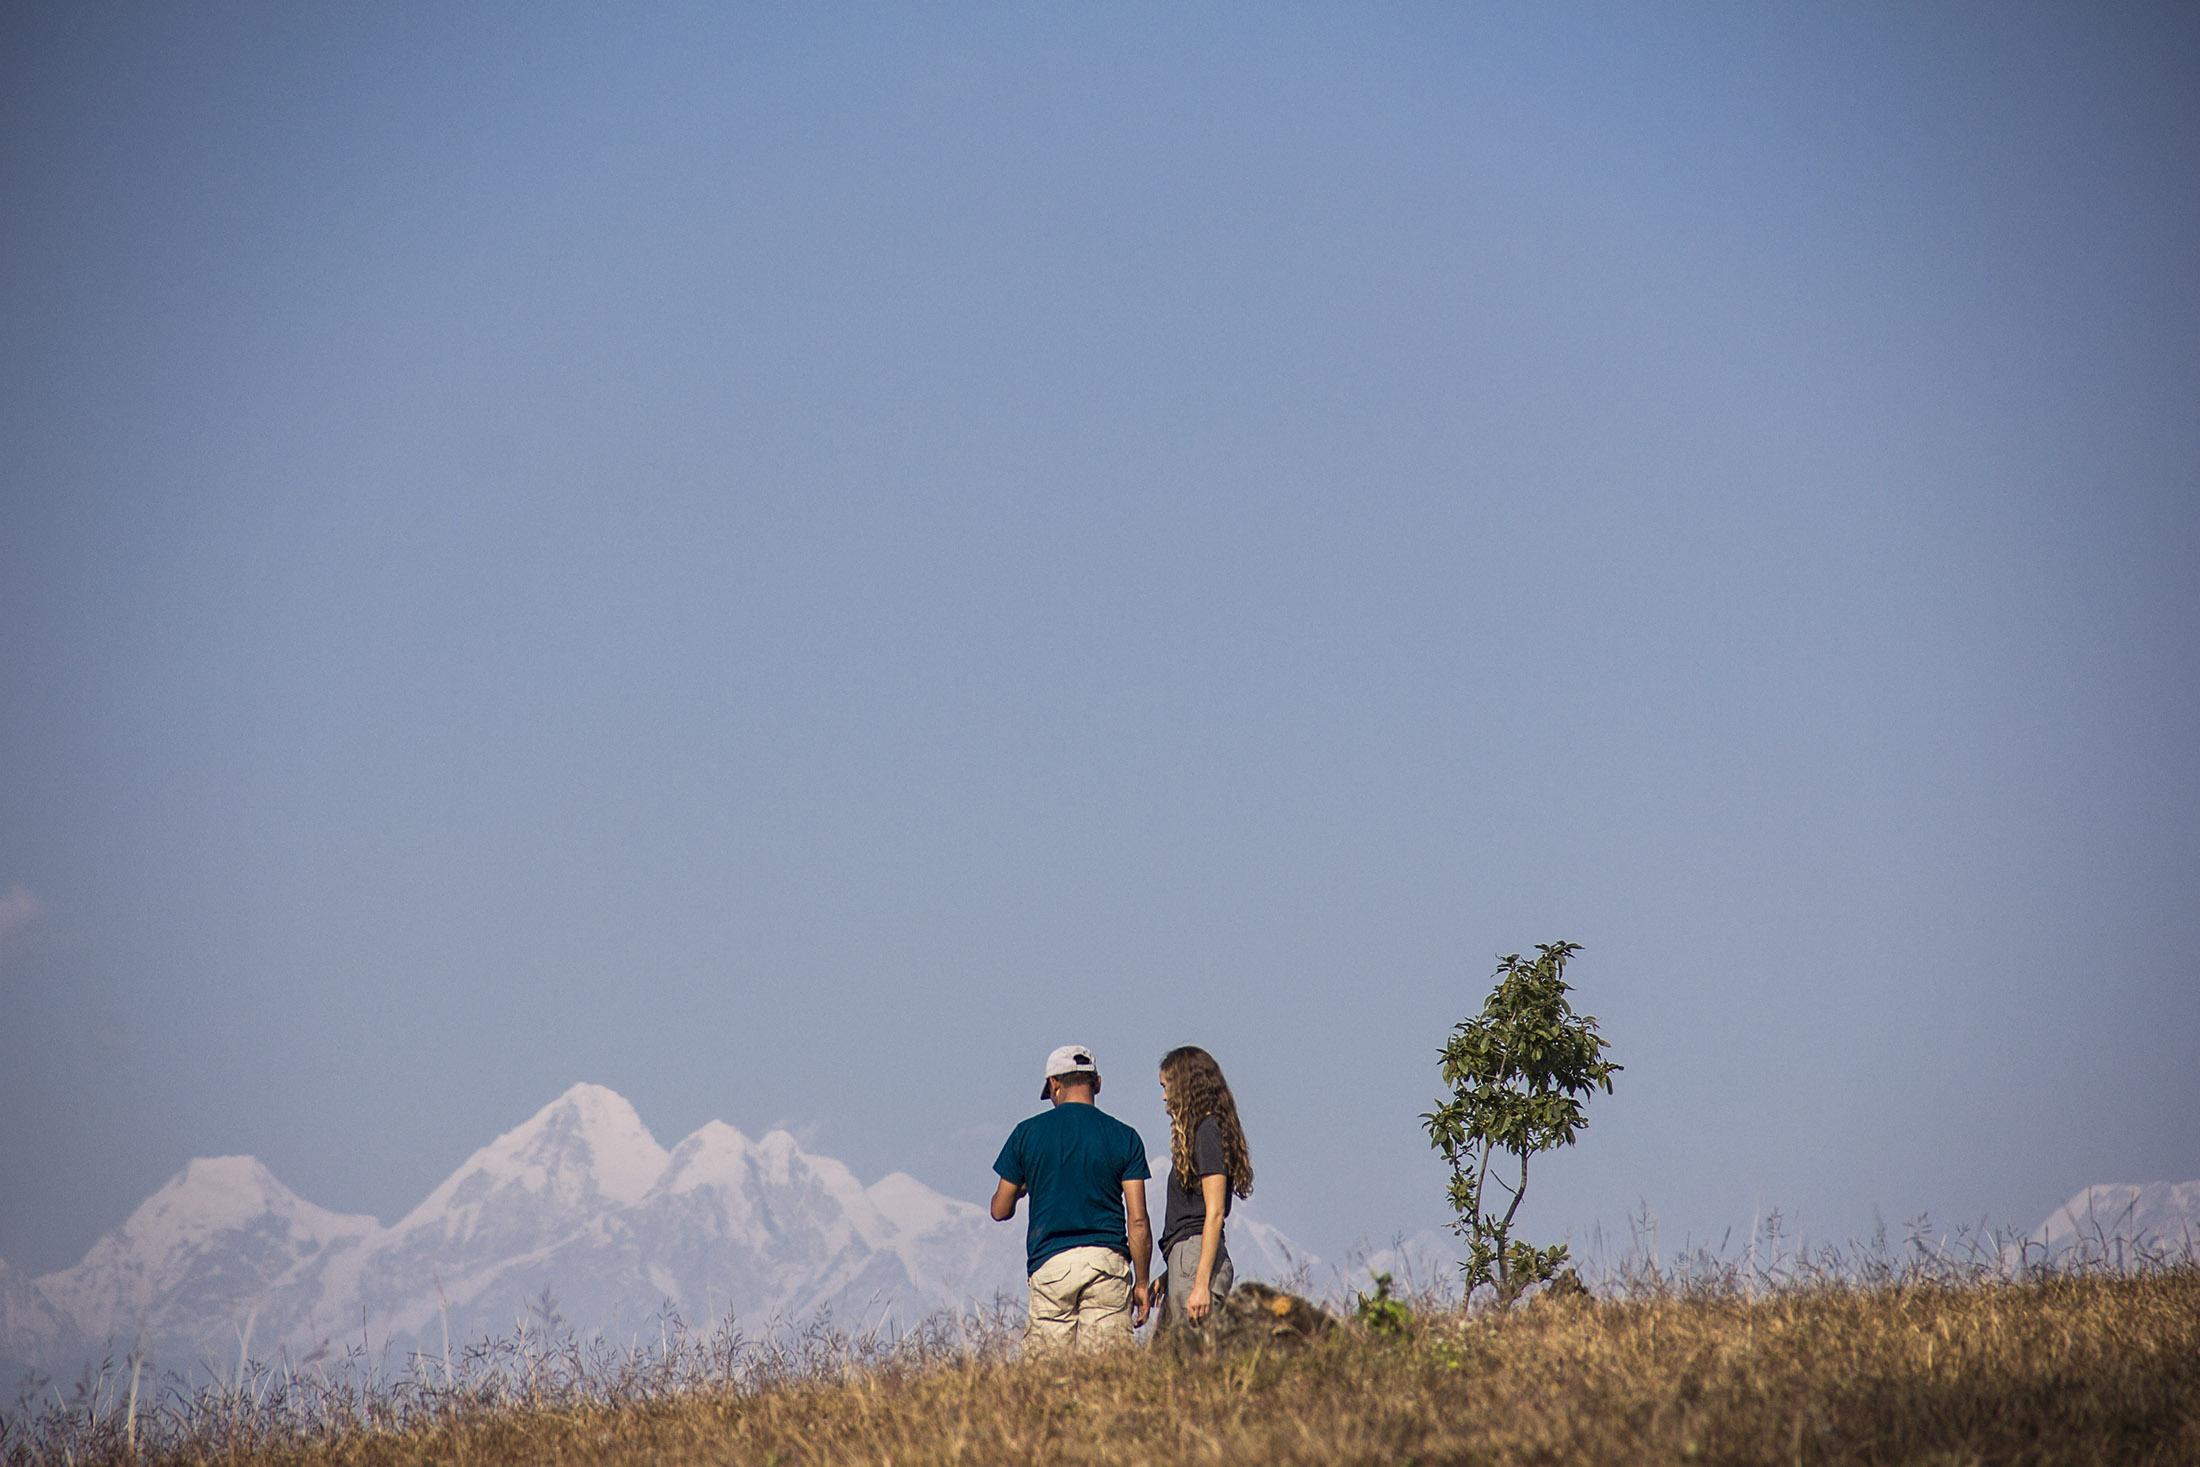 The New Sanga-Panauti Community Hike Initiative